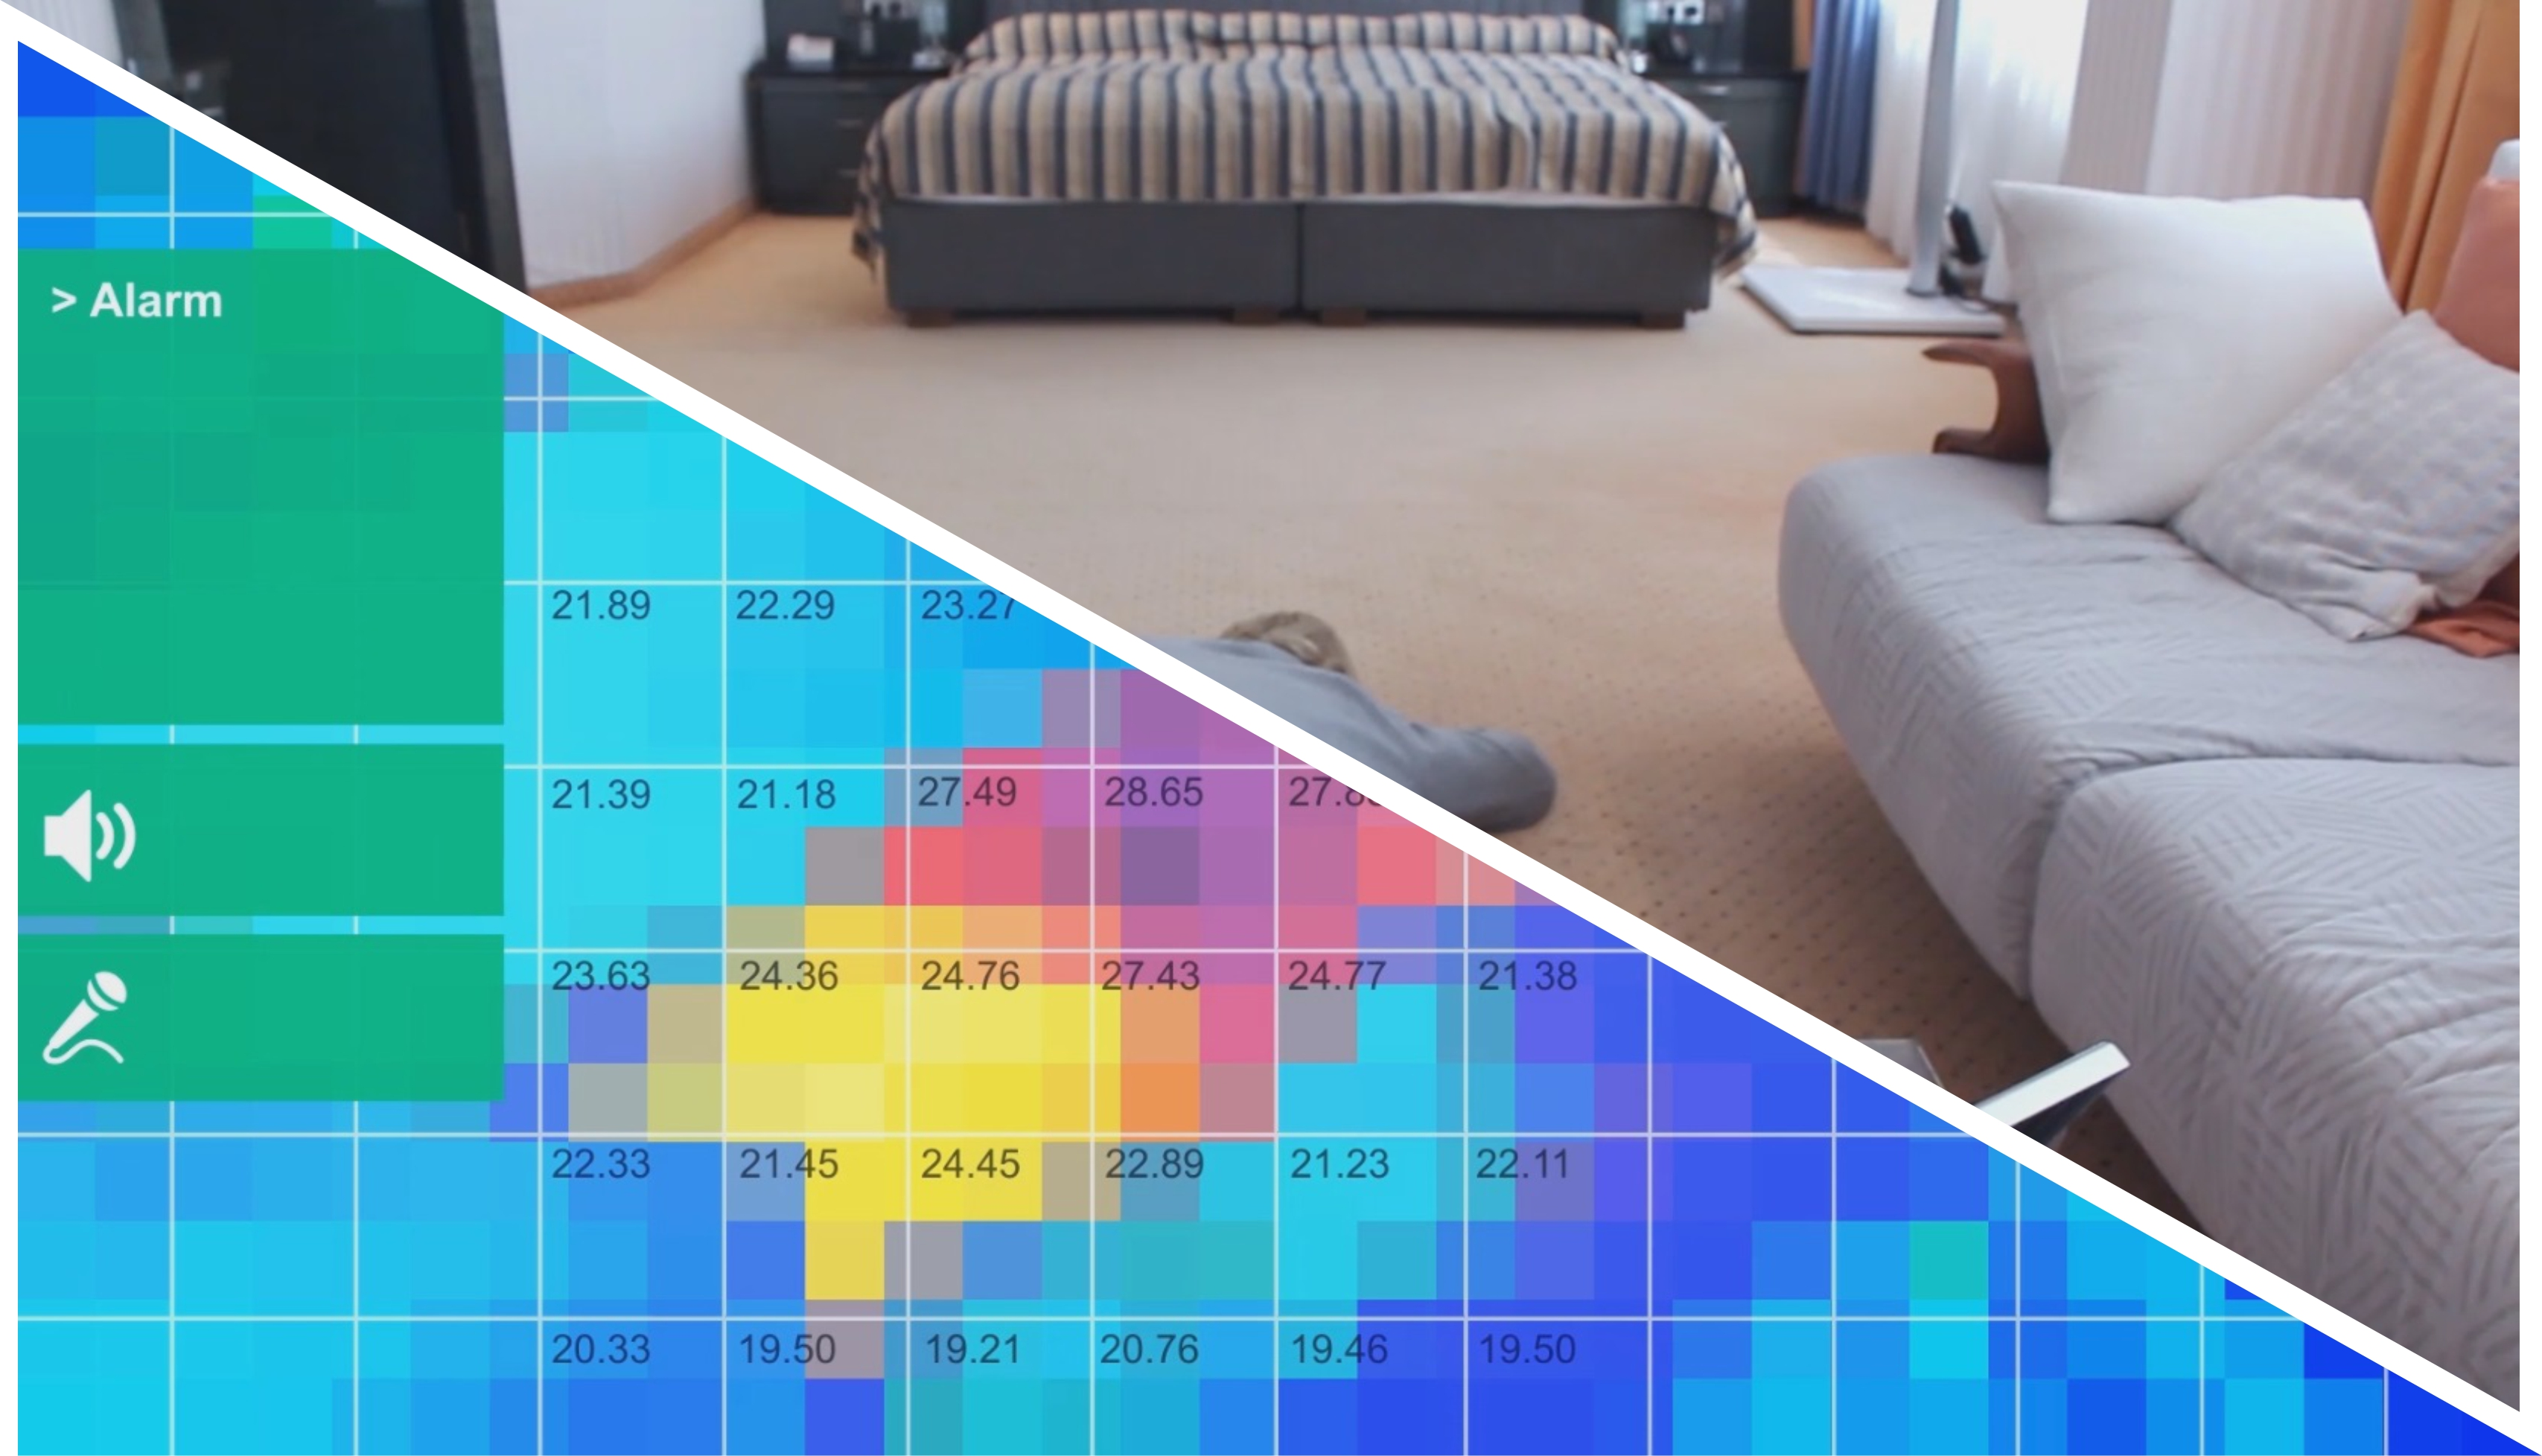 Figure 2 - The Grannyguard analyzes heat maps to detect a fallen user.